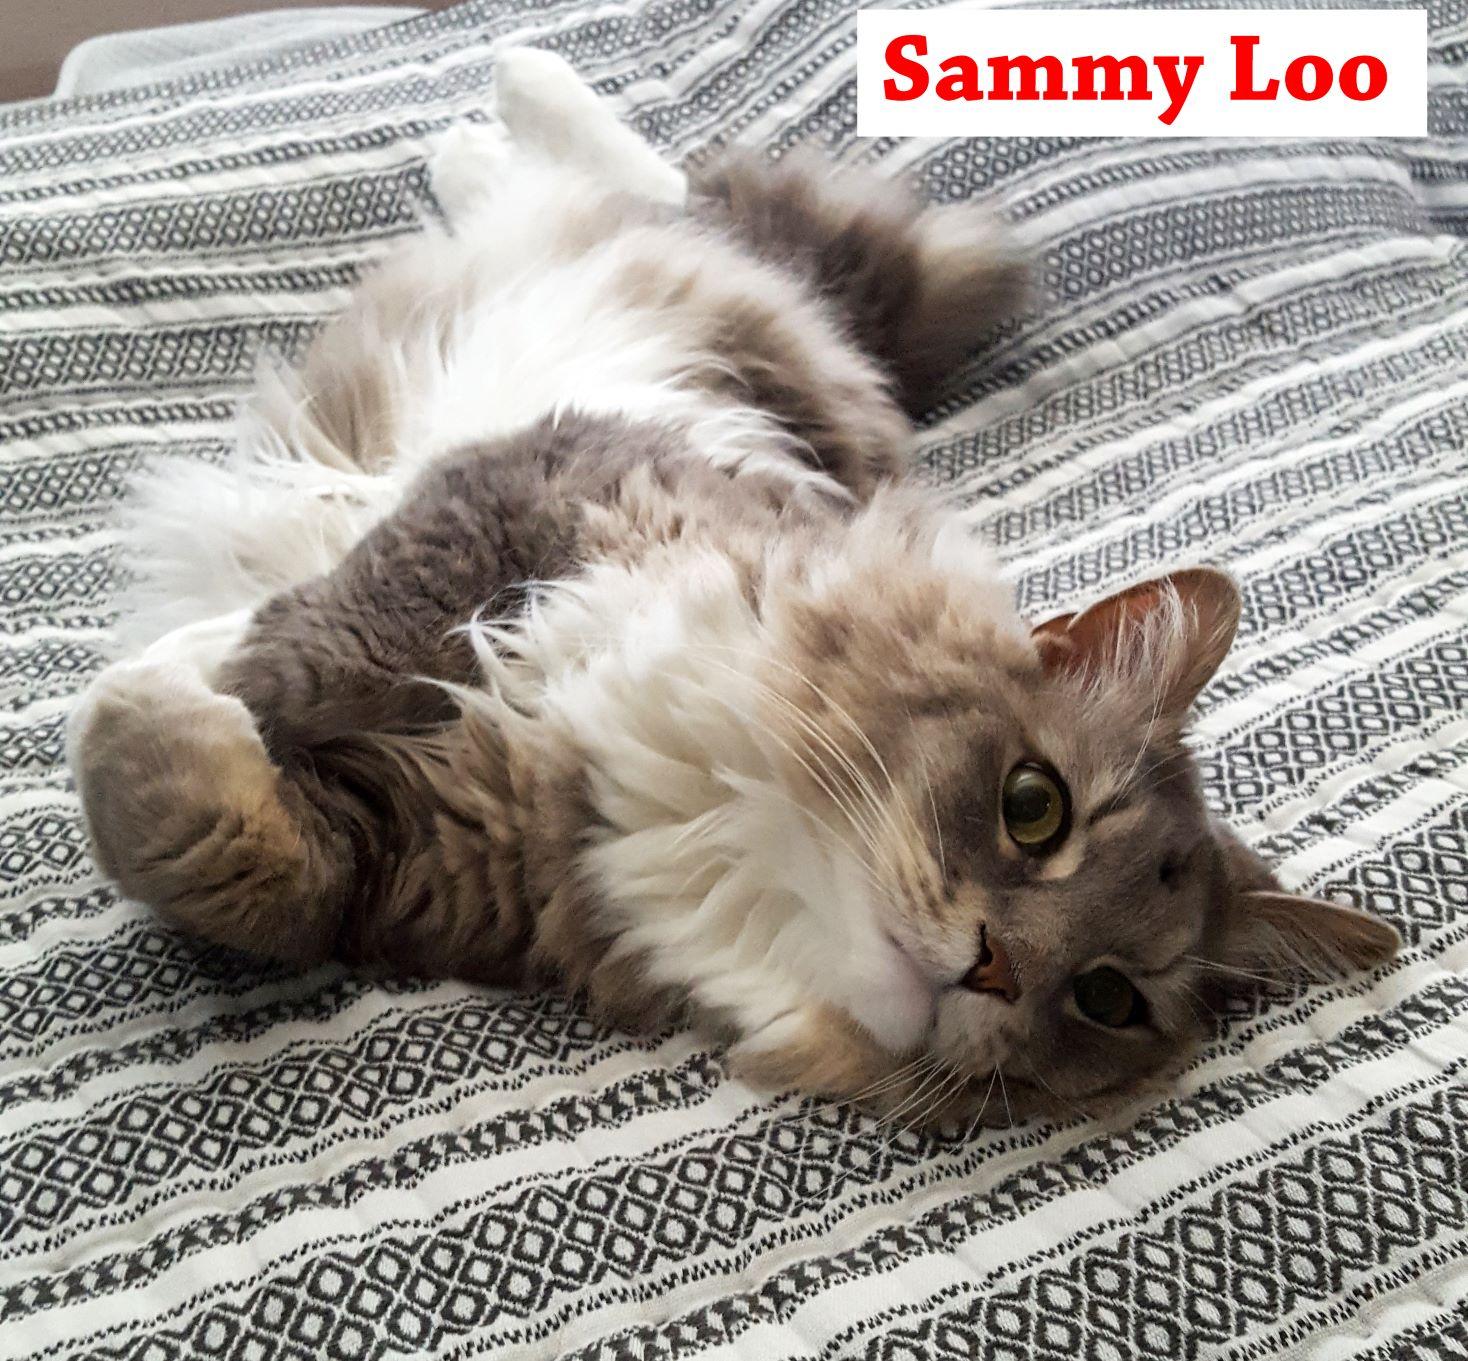 Sammy Loo Adoption